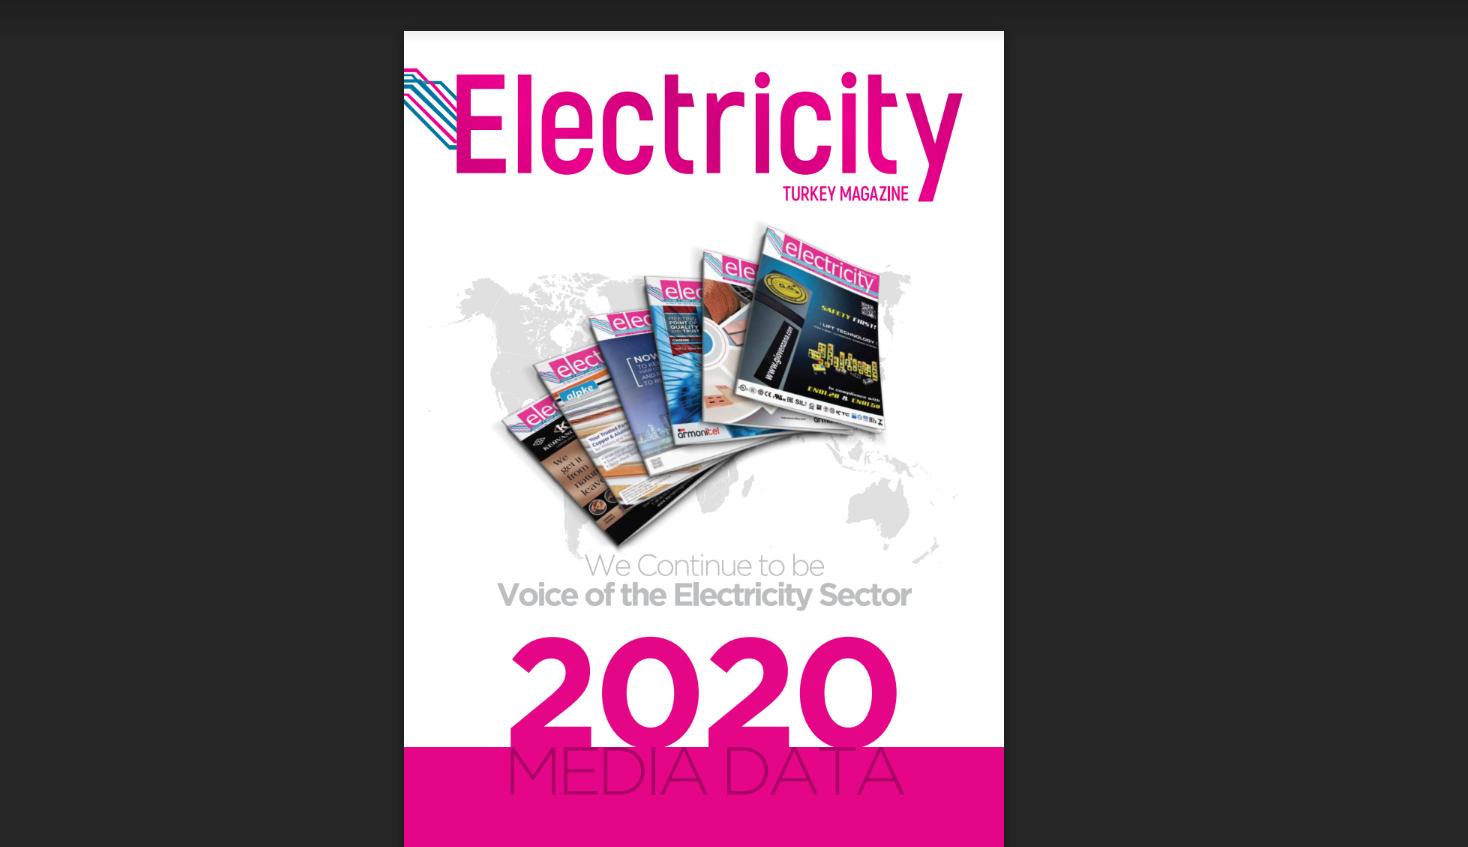 ELECTRICITY TURKEY DERGİSİ 2020 MEDIA KIT